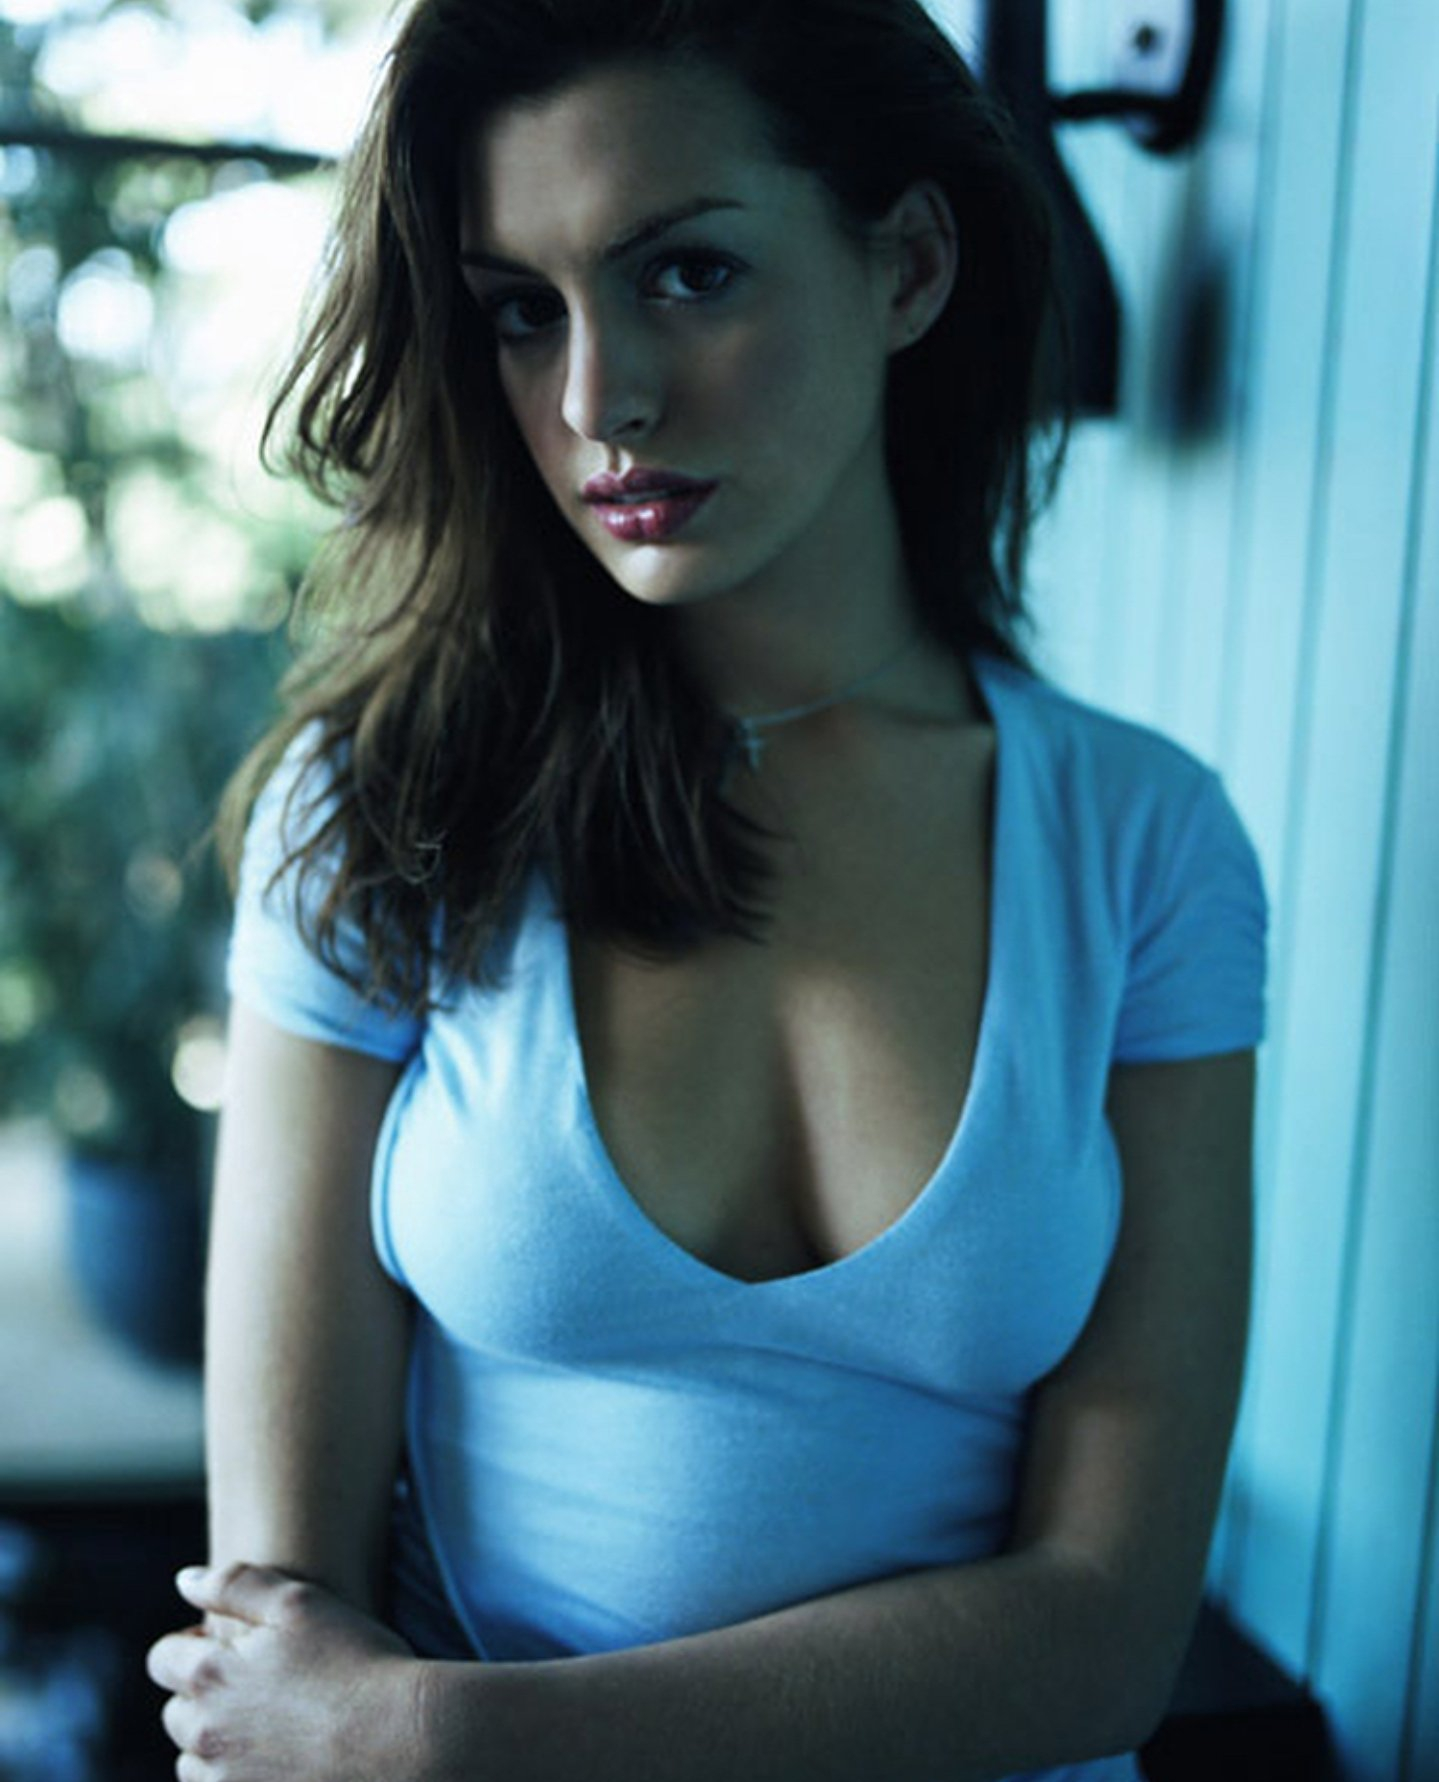 Anne Hathaway At 23.